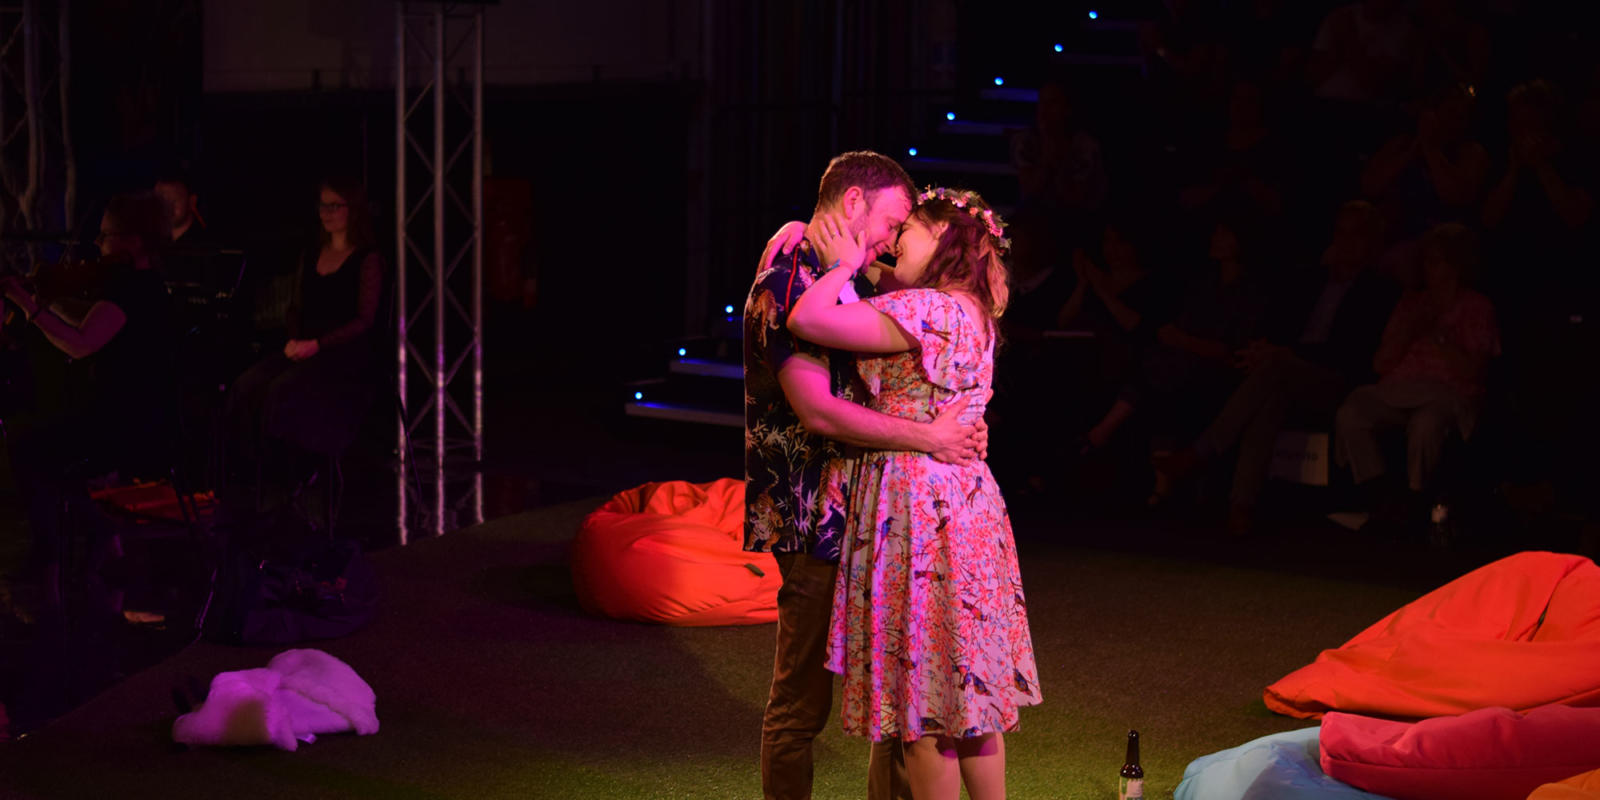 ENO Studio Live: Acis and Galatea Lucy Hall as Galatea Alexander Sprague and Acis (c) Dani Harvey